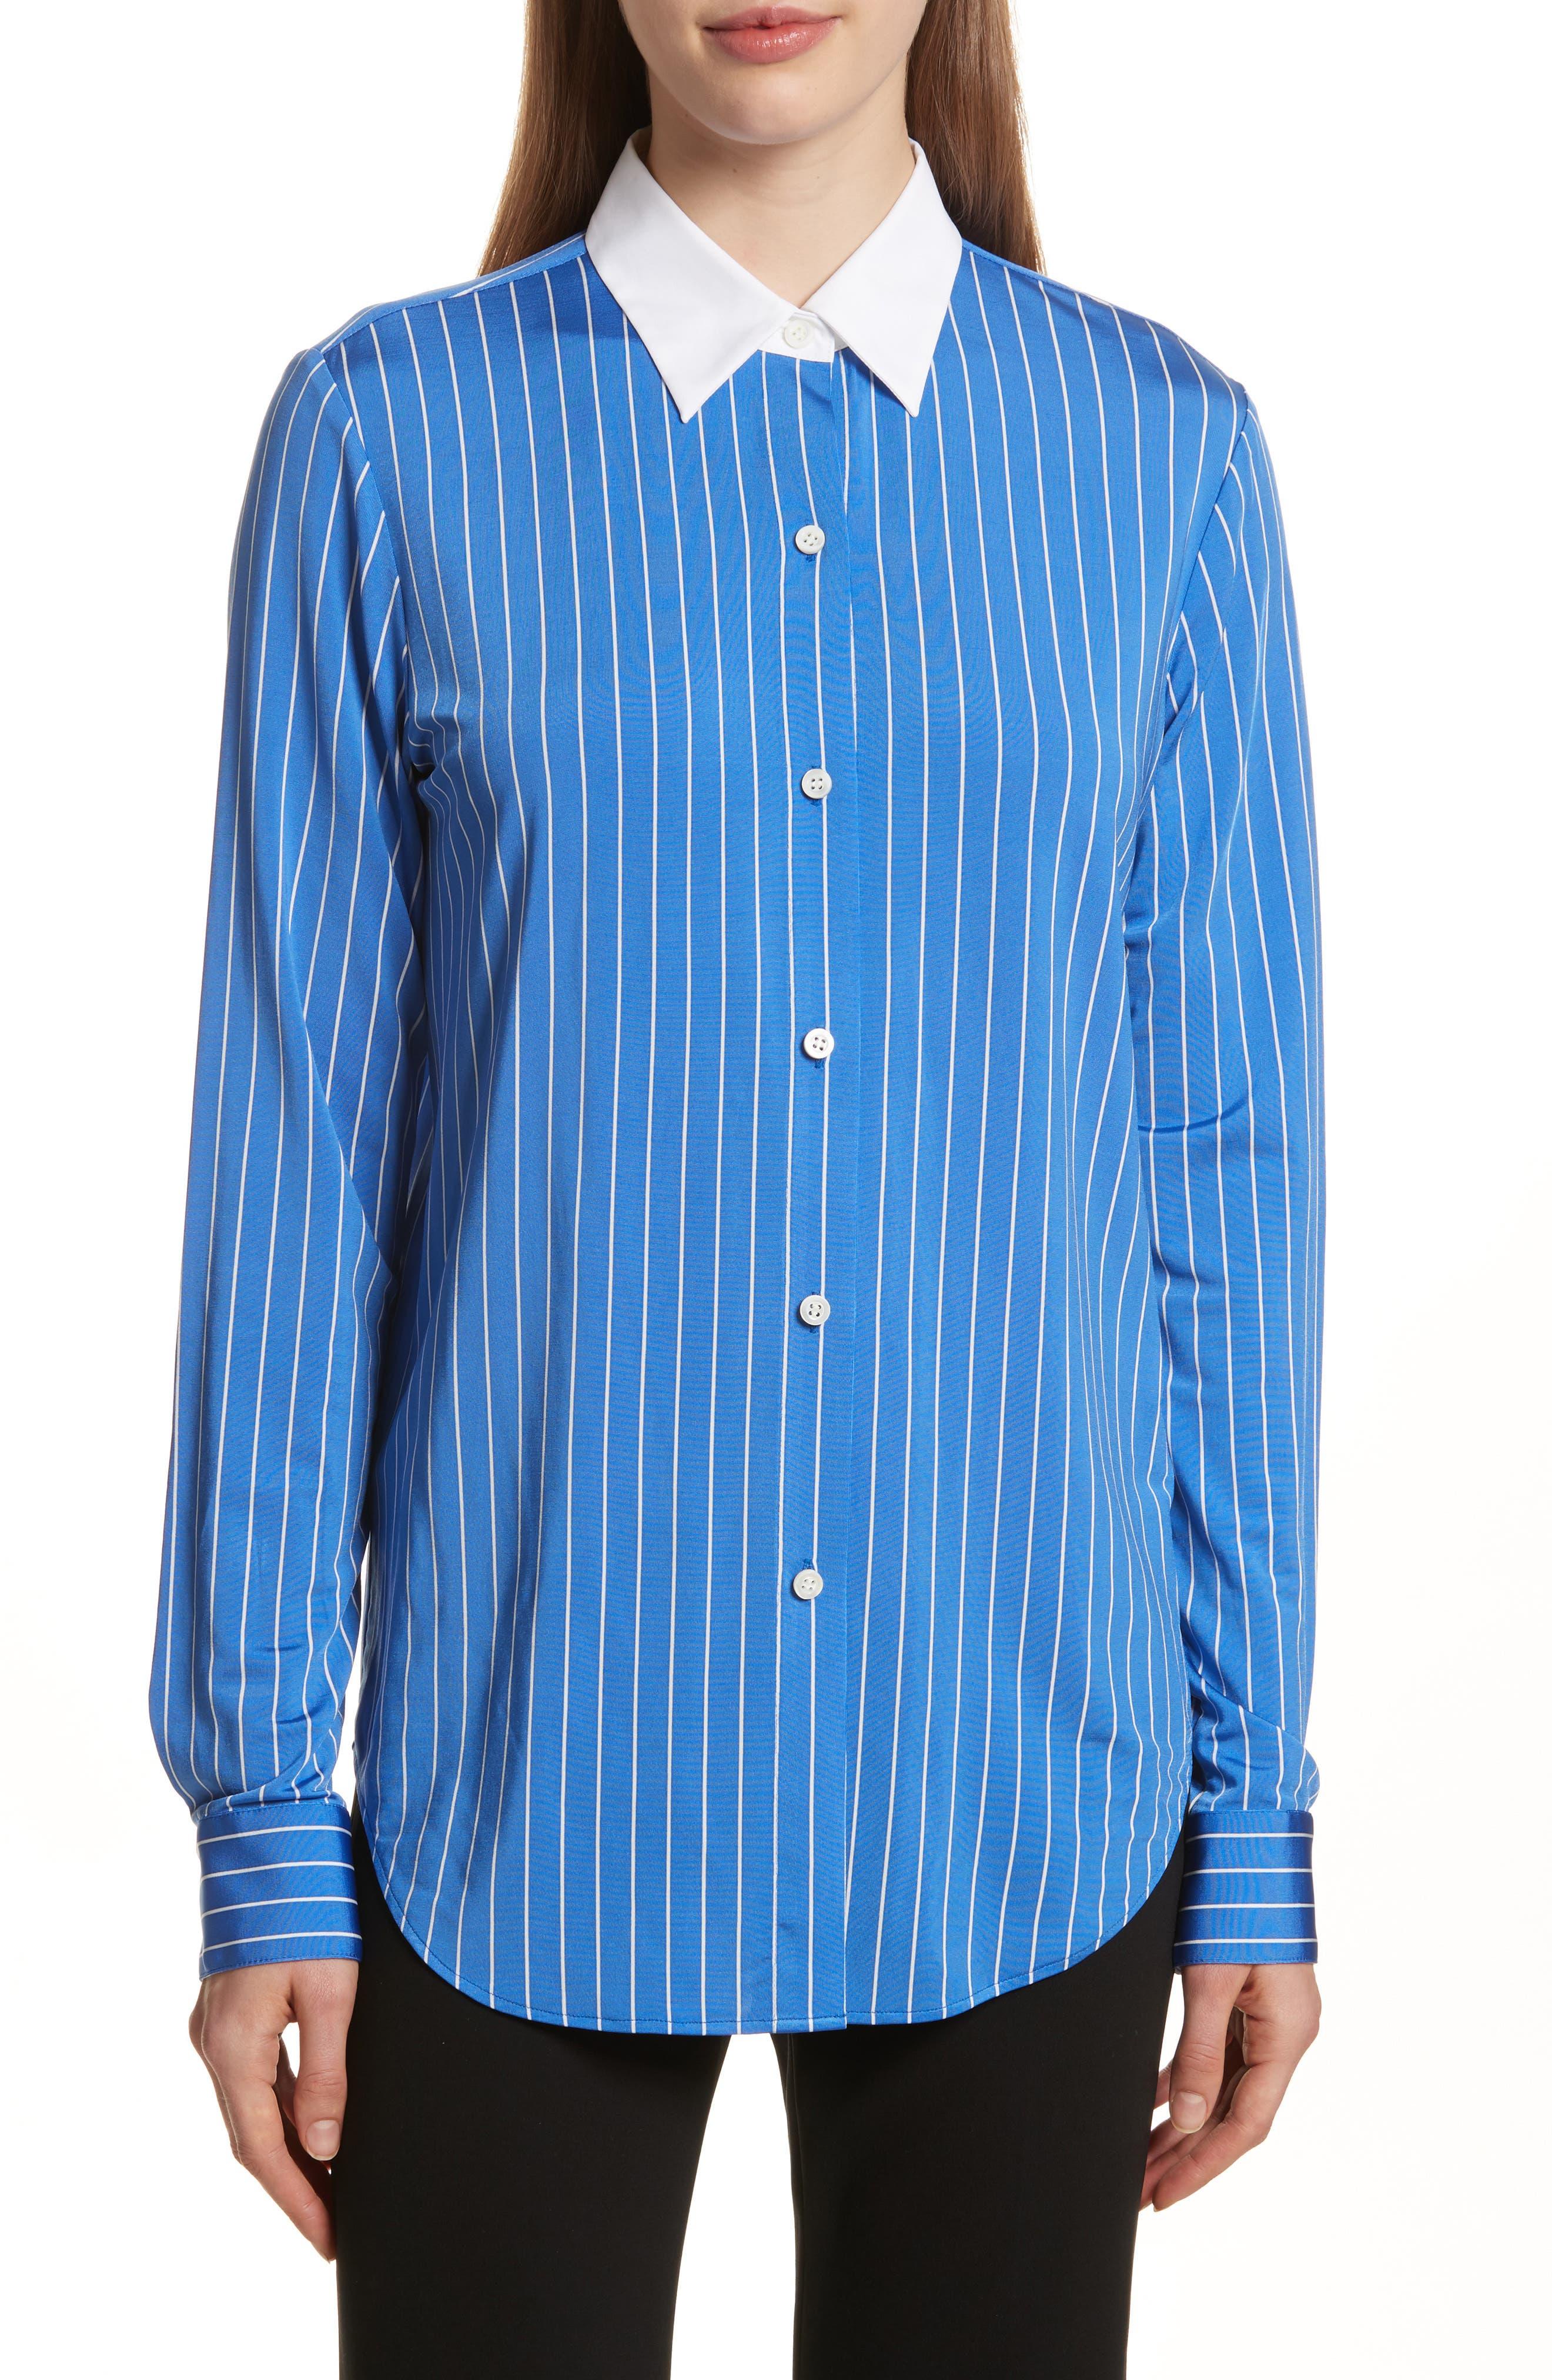 Essential Stripe Jersey Button Down Shirt,                         Main,                         color, Blue/ White